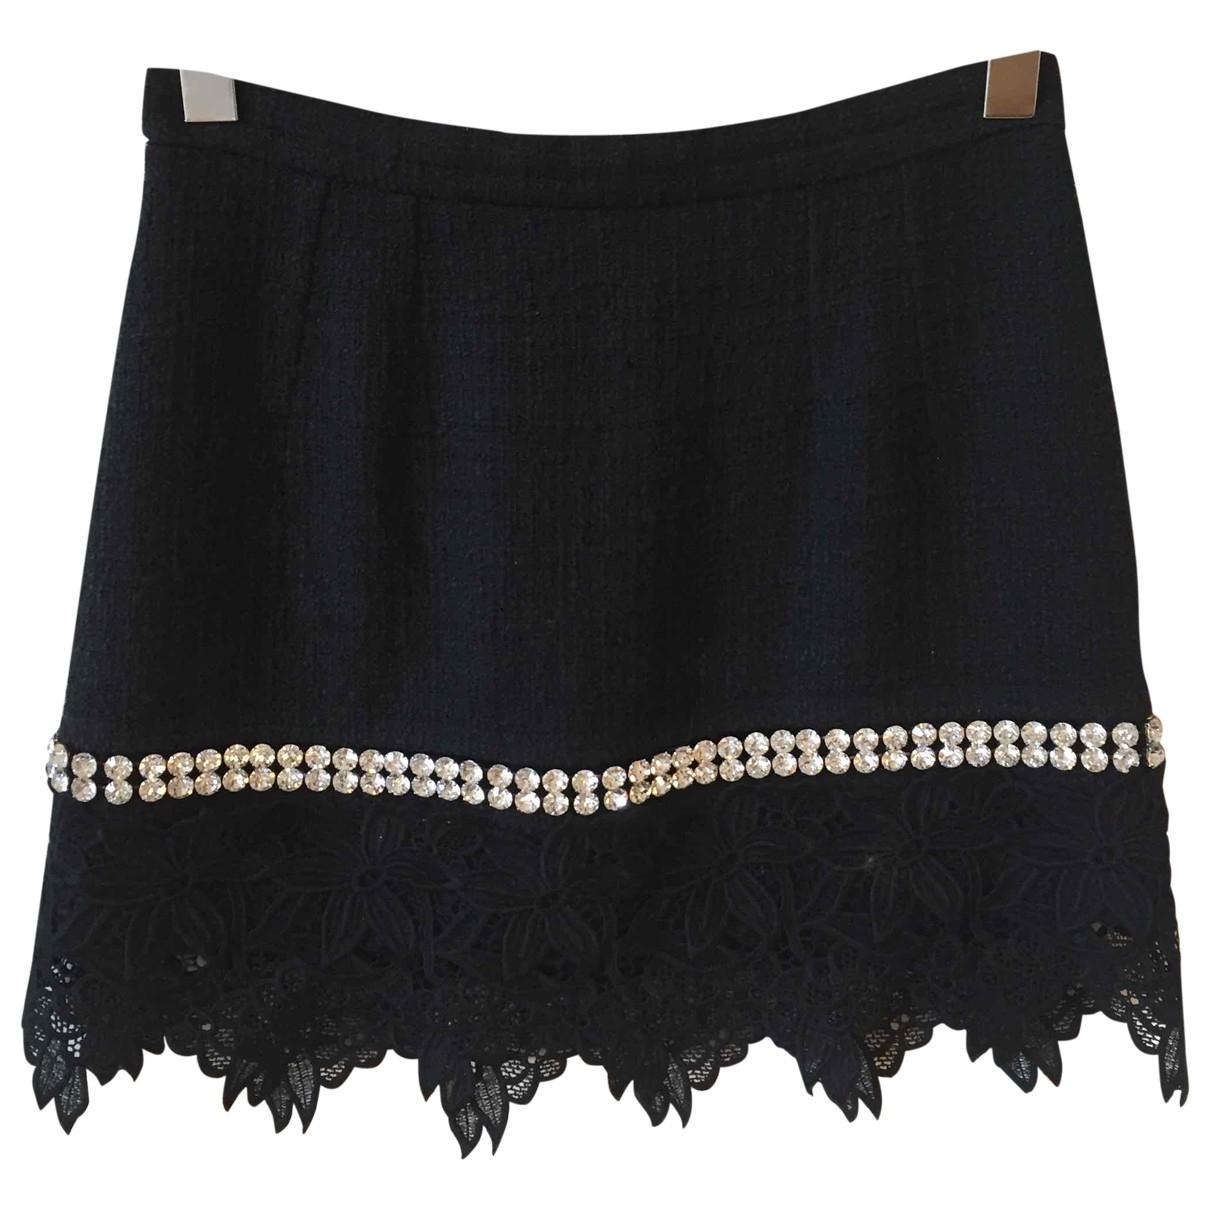 Dolce & Gabbana \N Black Tweed skirt for Women 42 IT